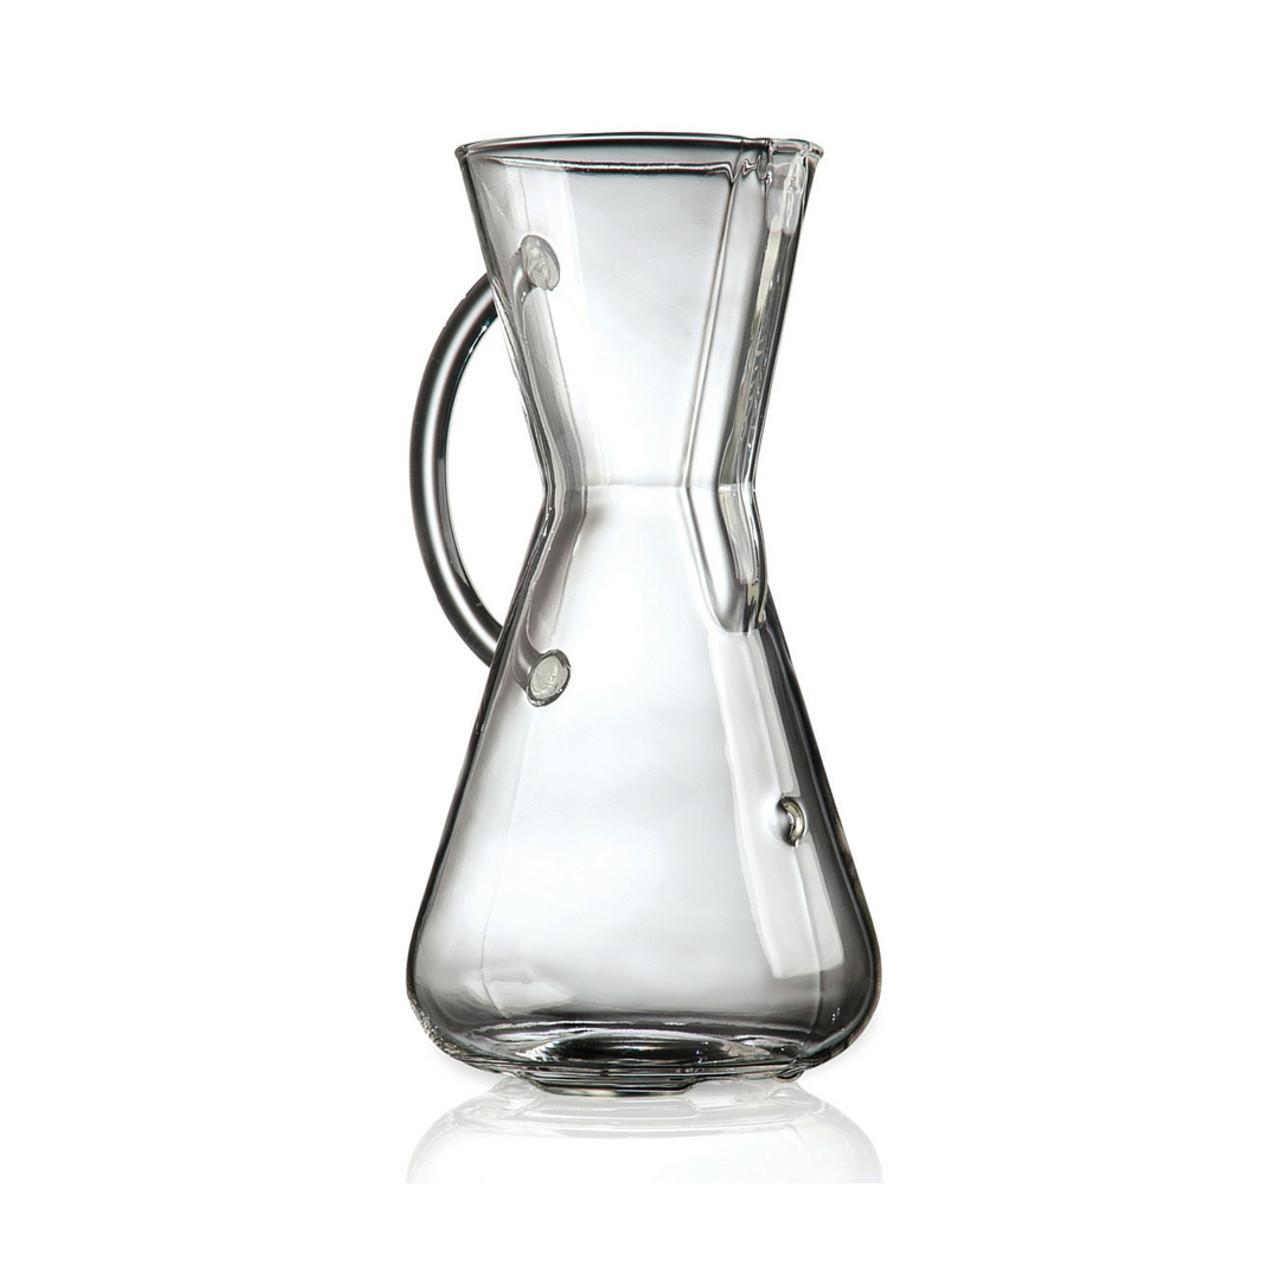 3 Cup Chemex Coffee Maker, Glass Handle